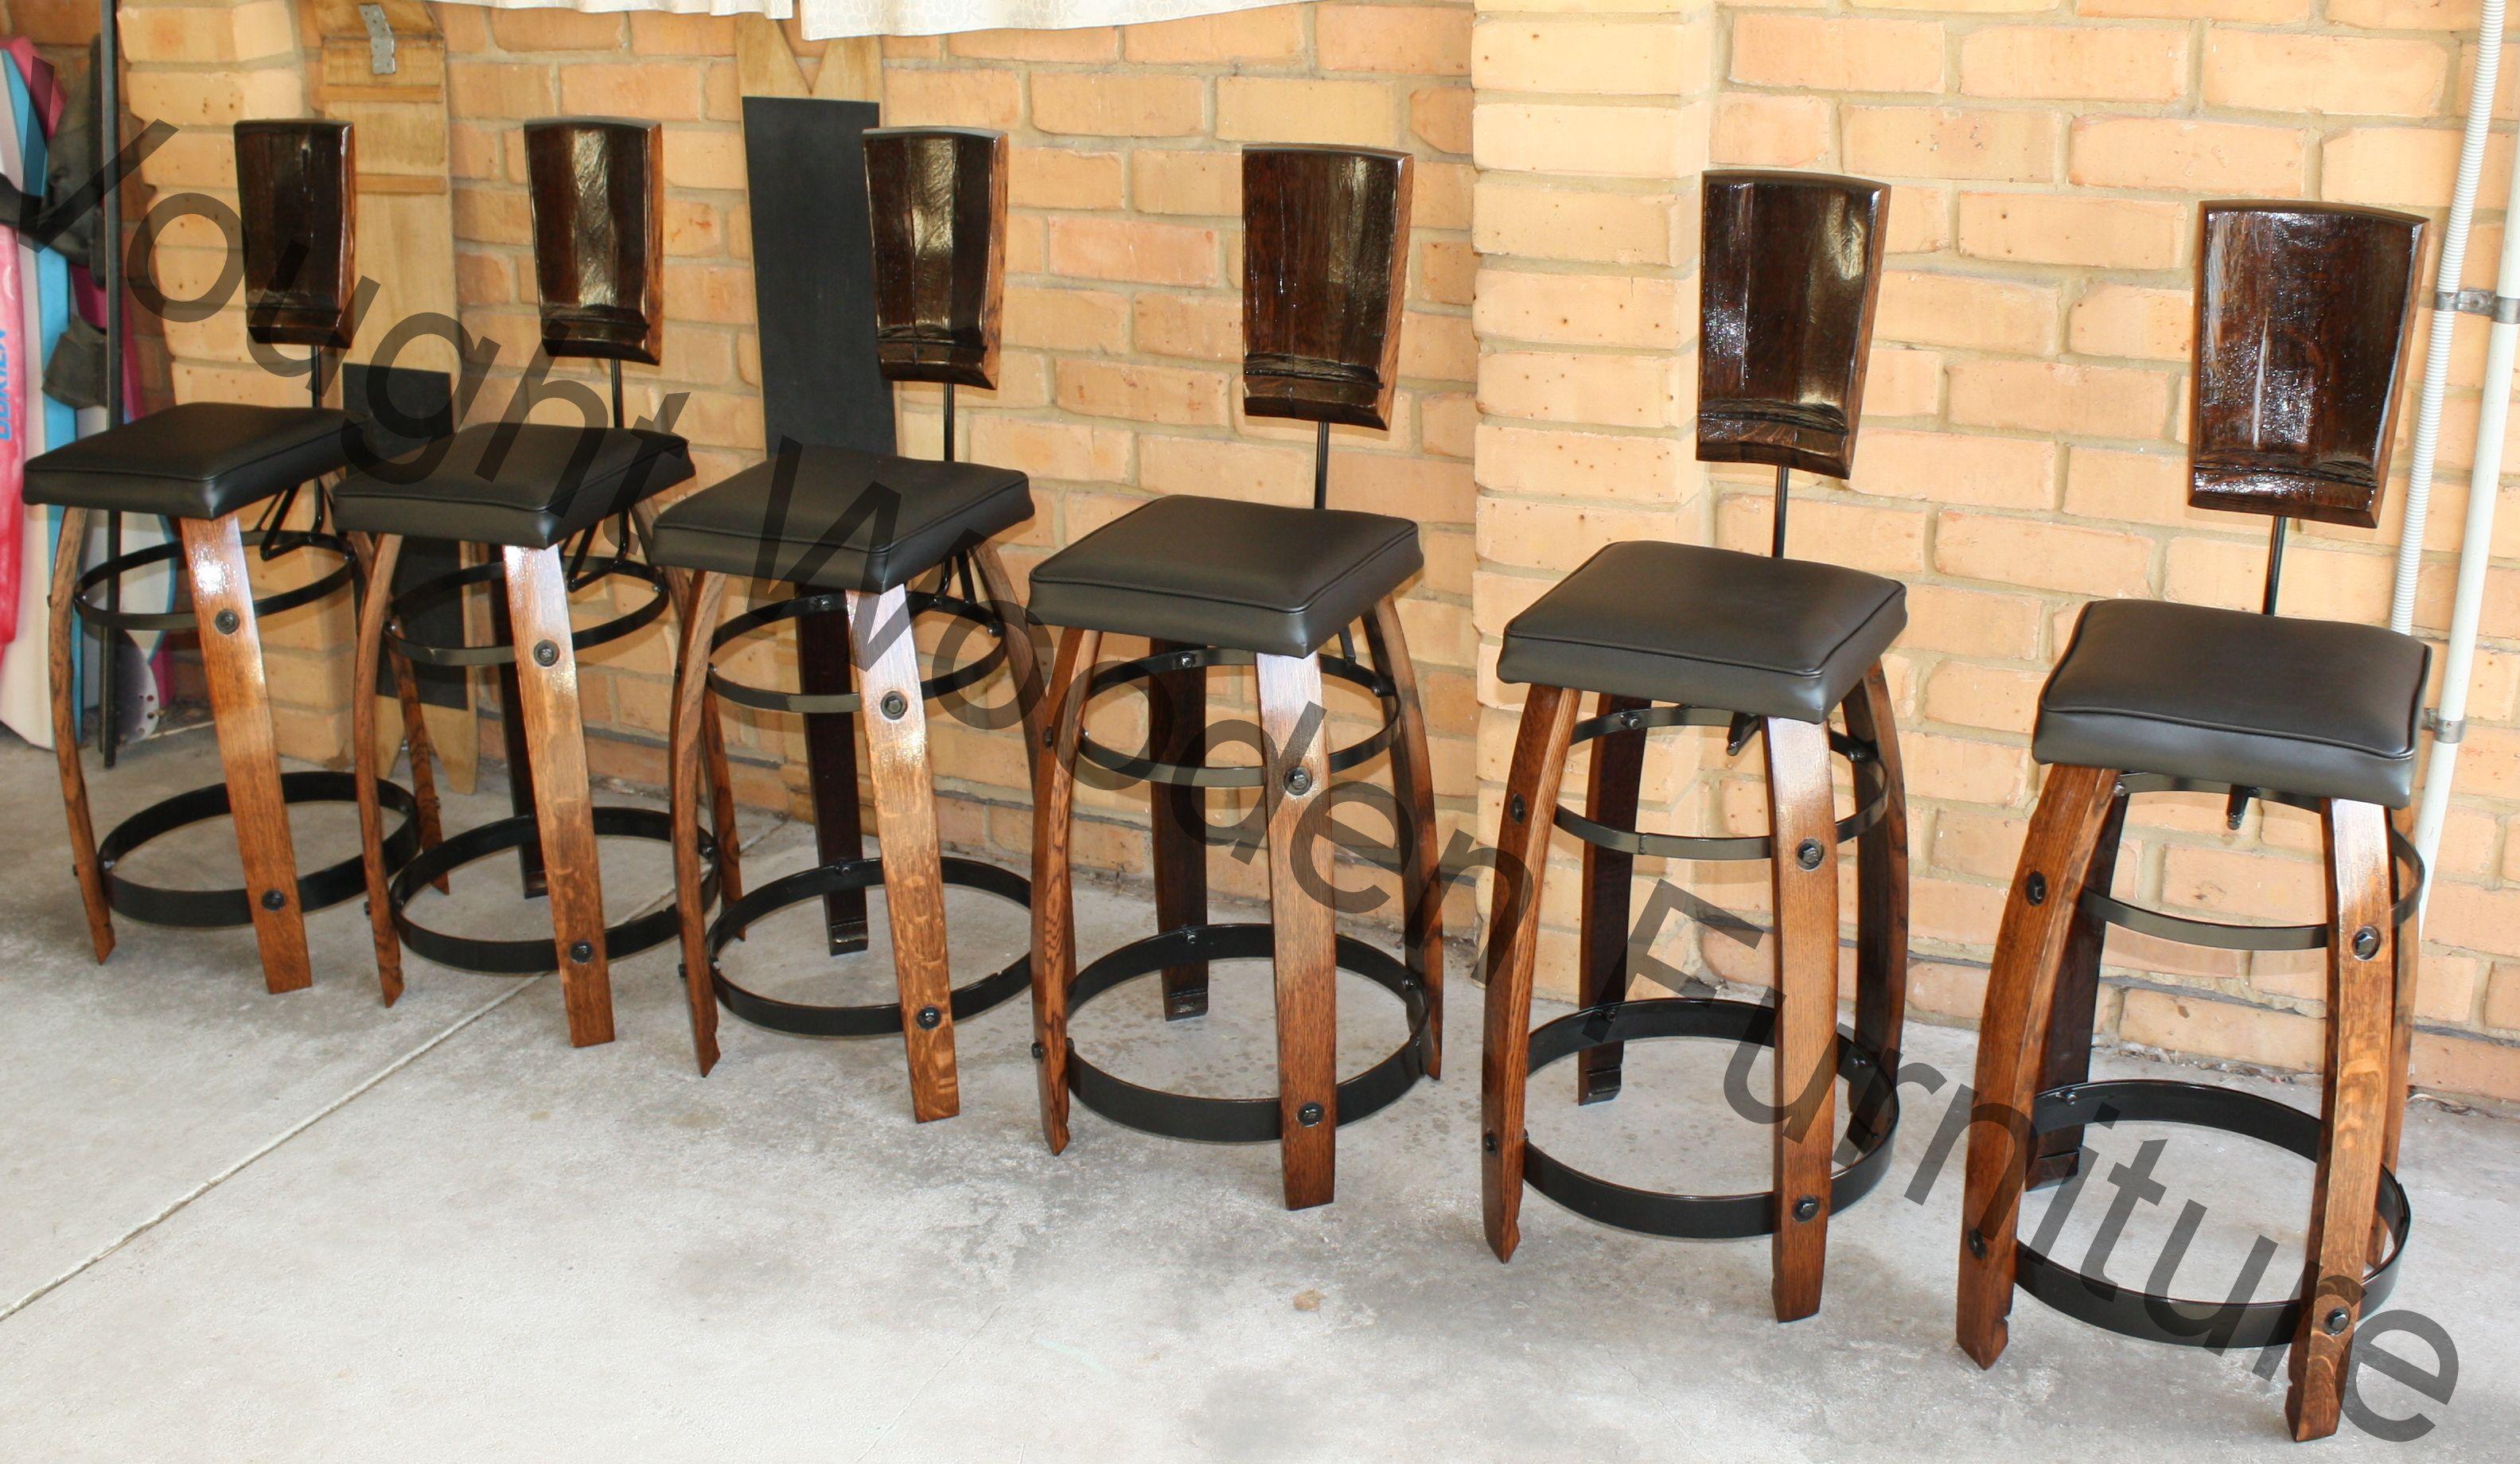 how to build a wine barrel bar stool